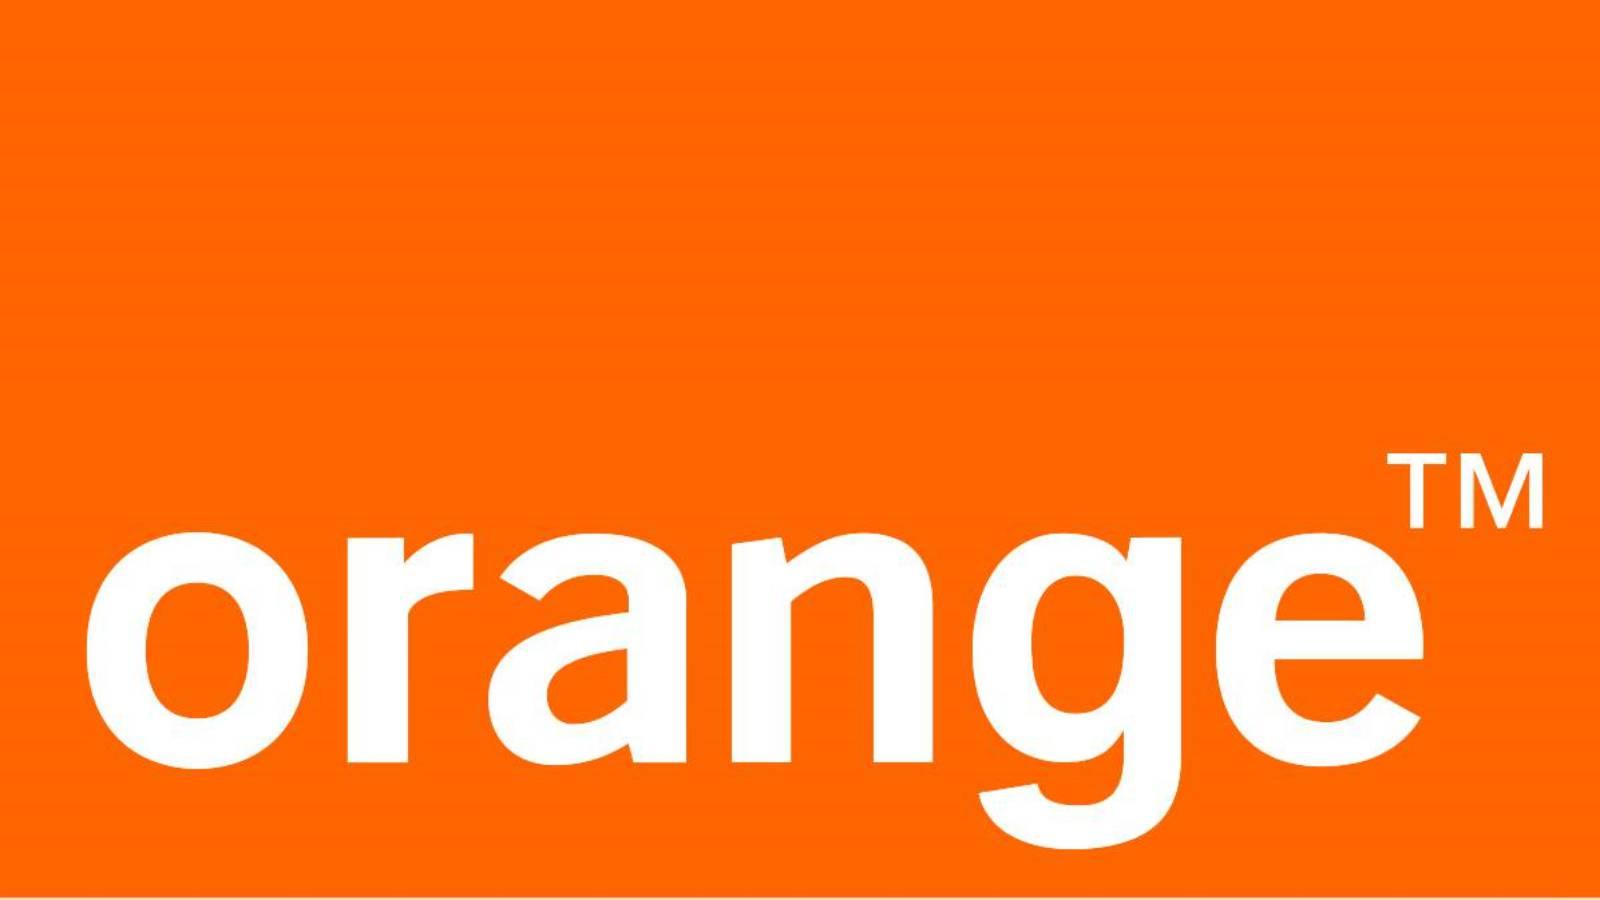 Orange sansa